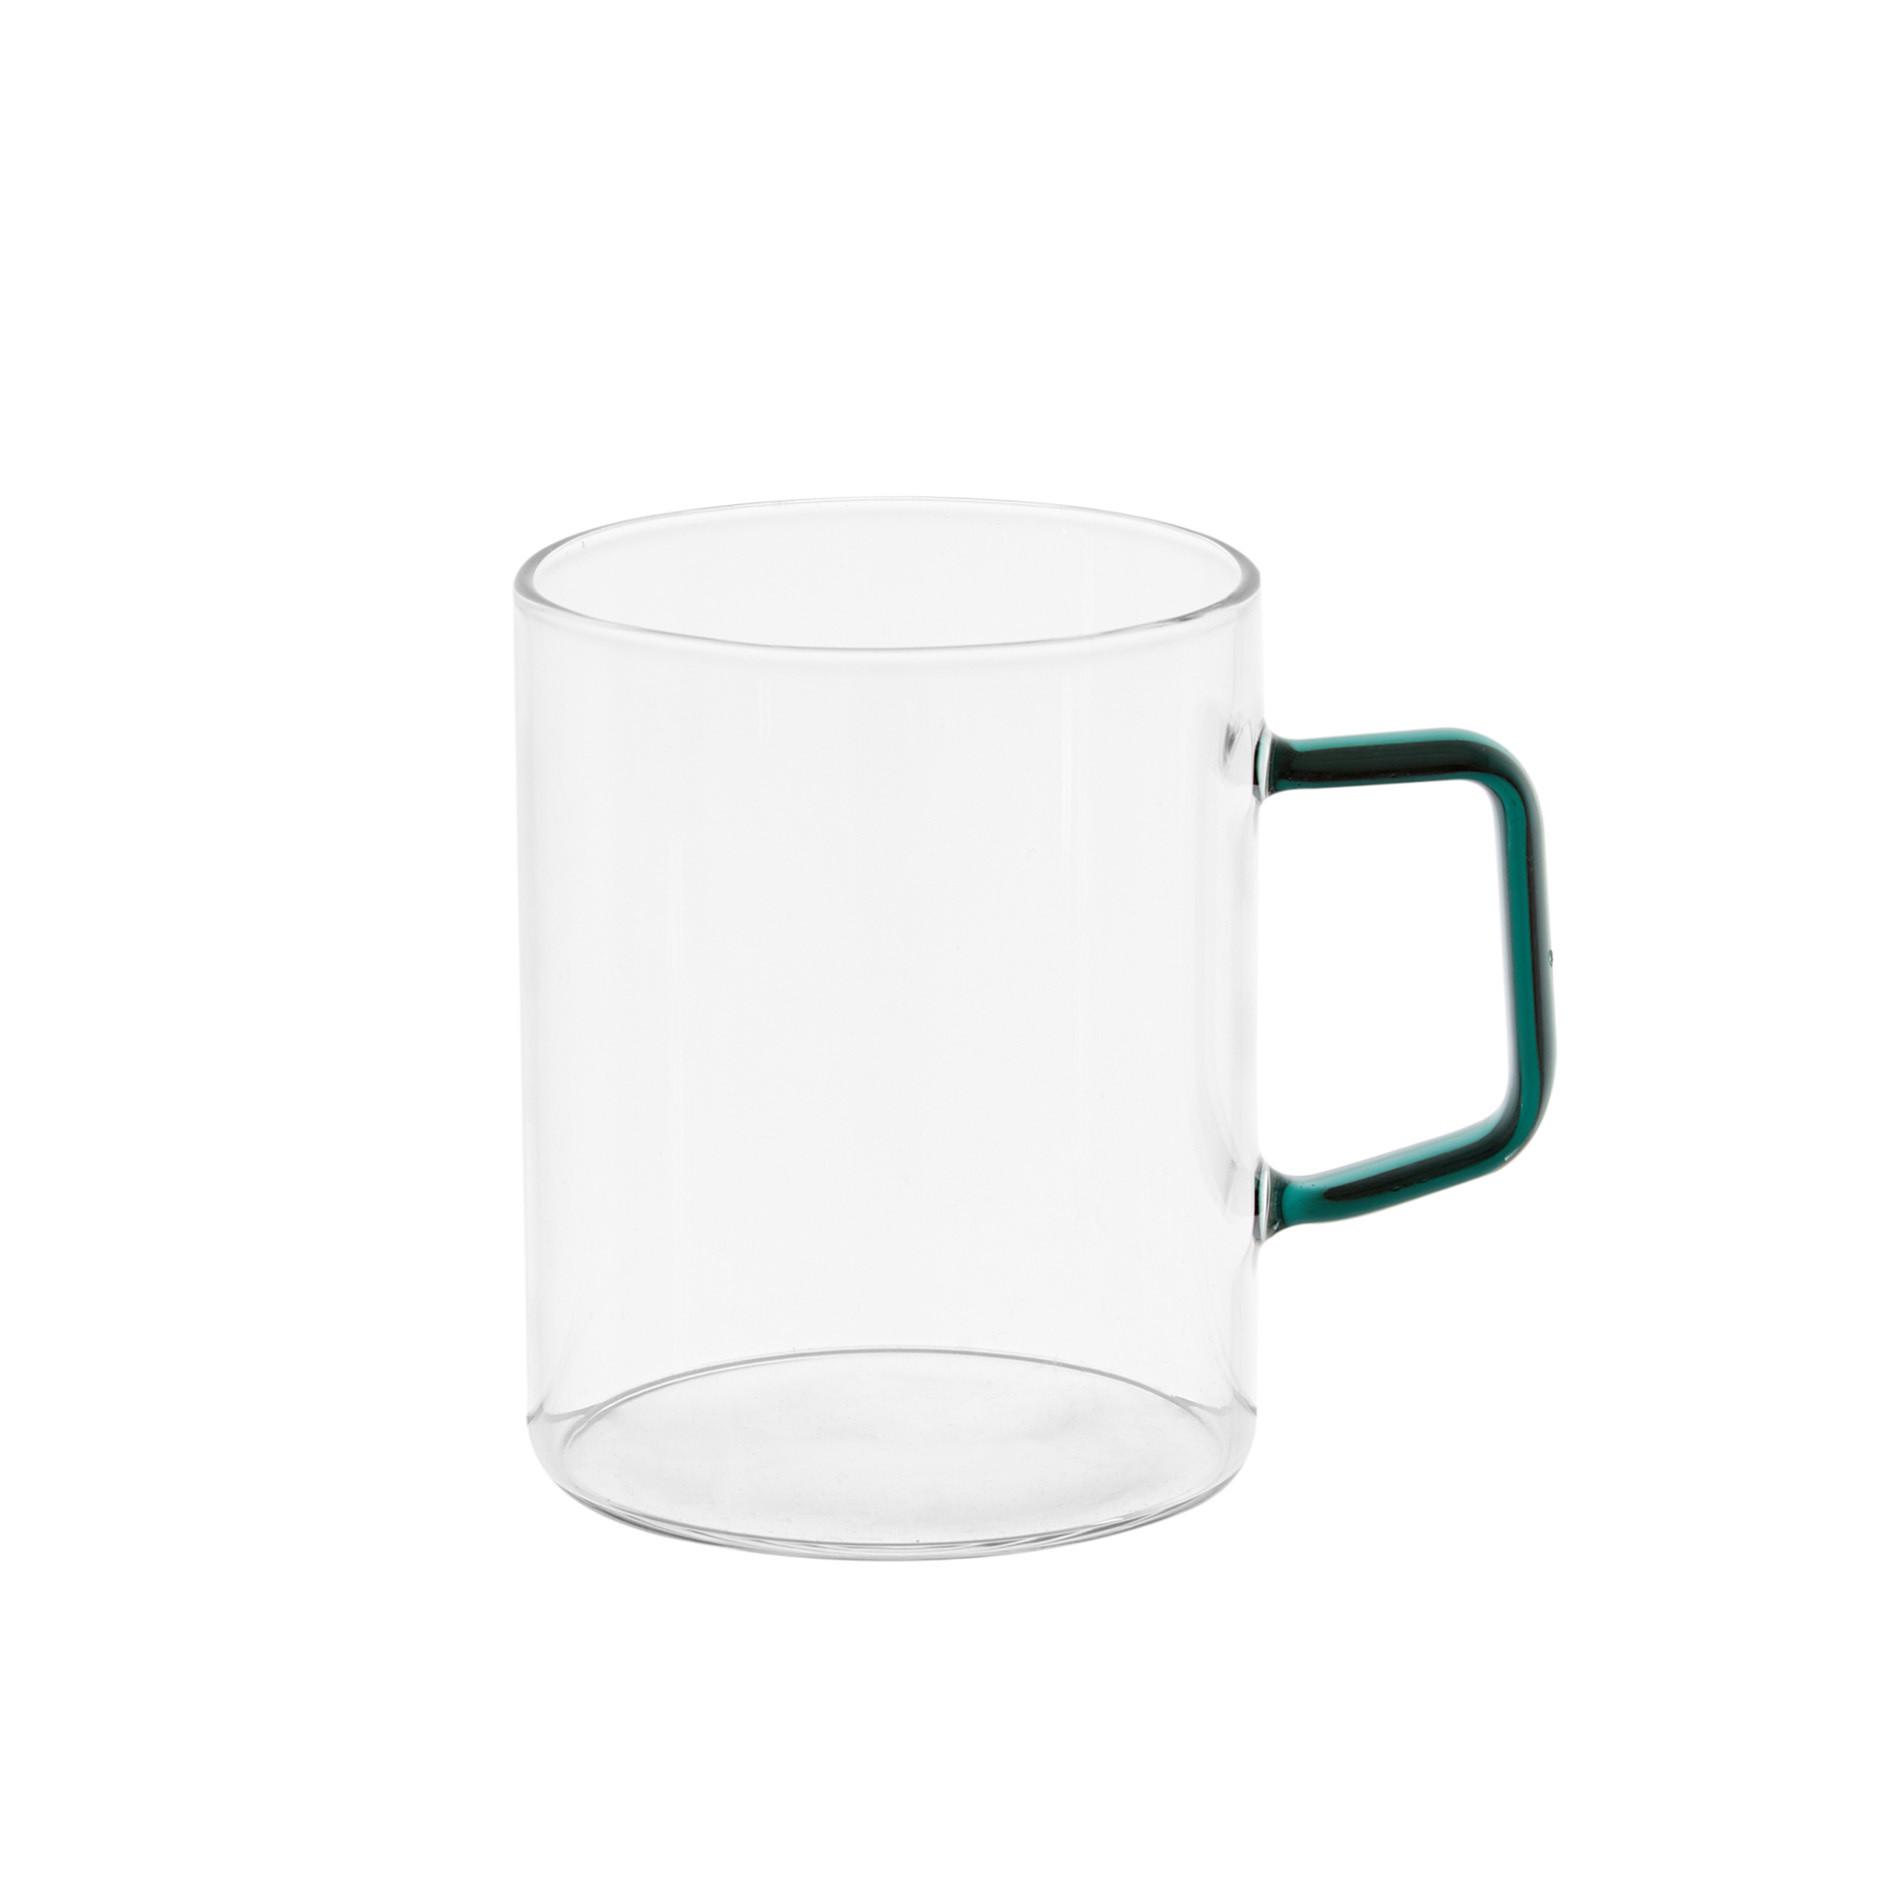 Mug vetro manico colorato, Trasparente, large image number 0